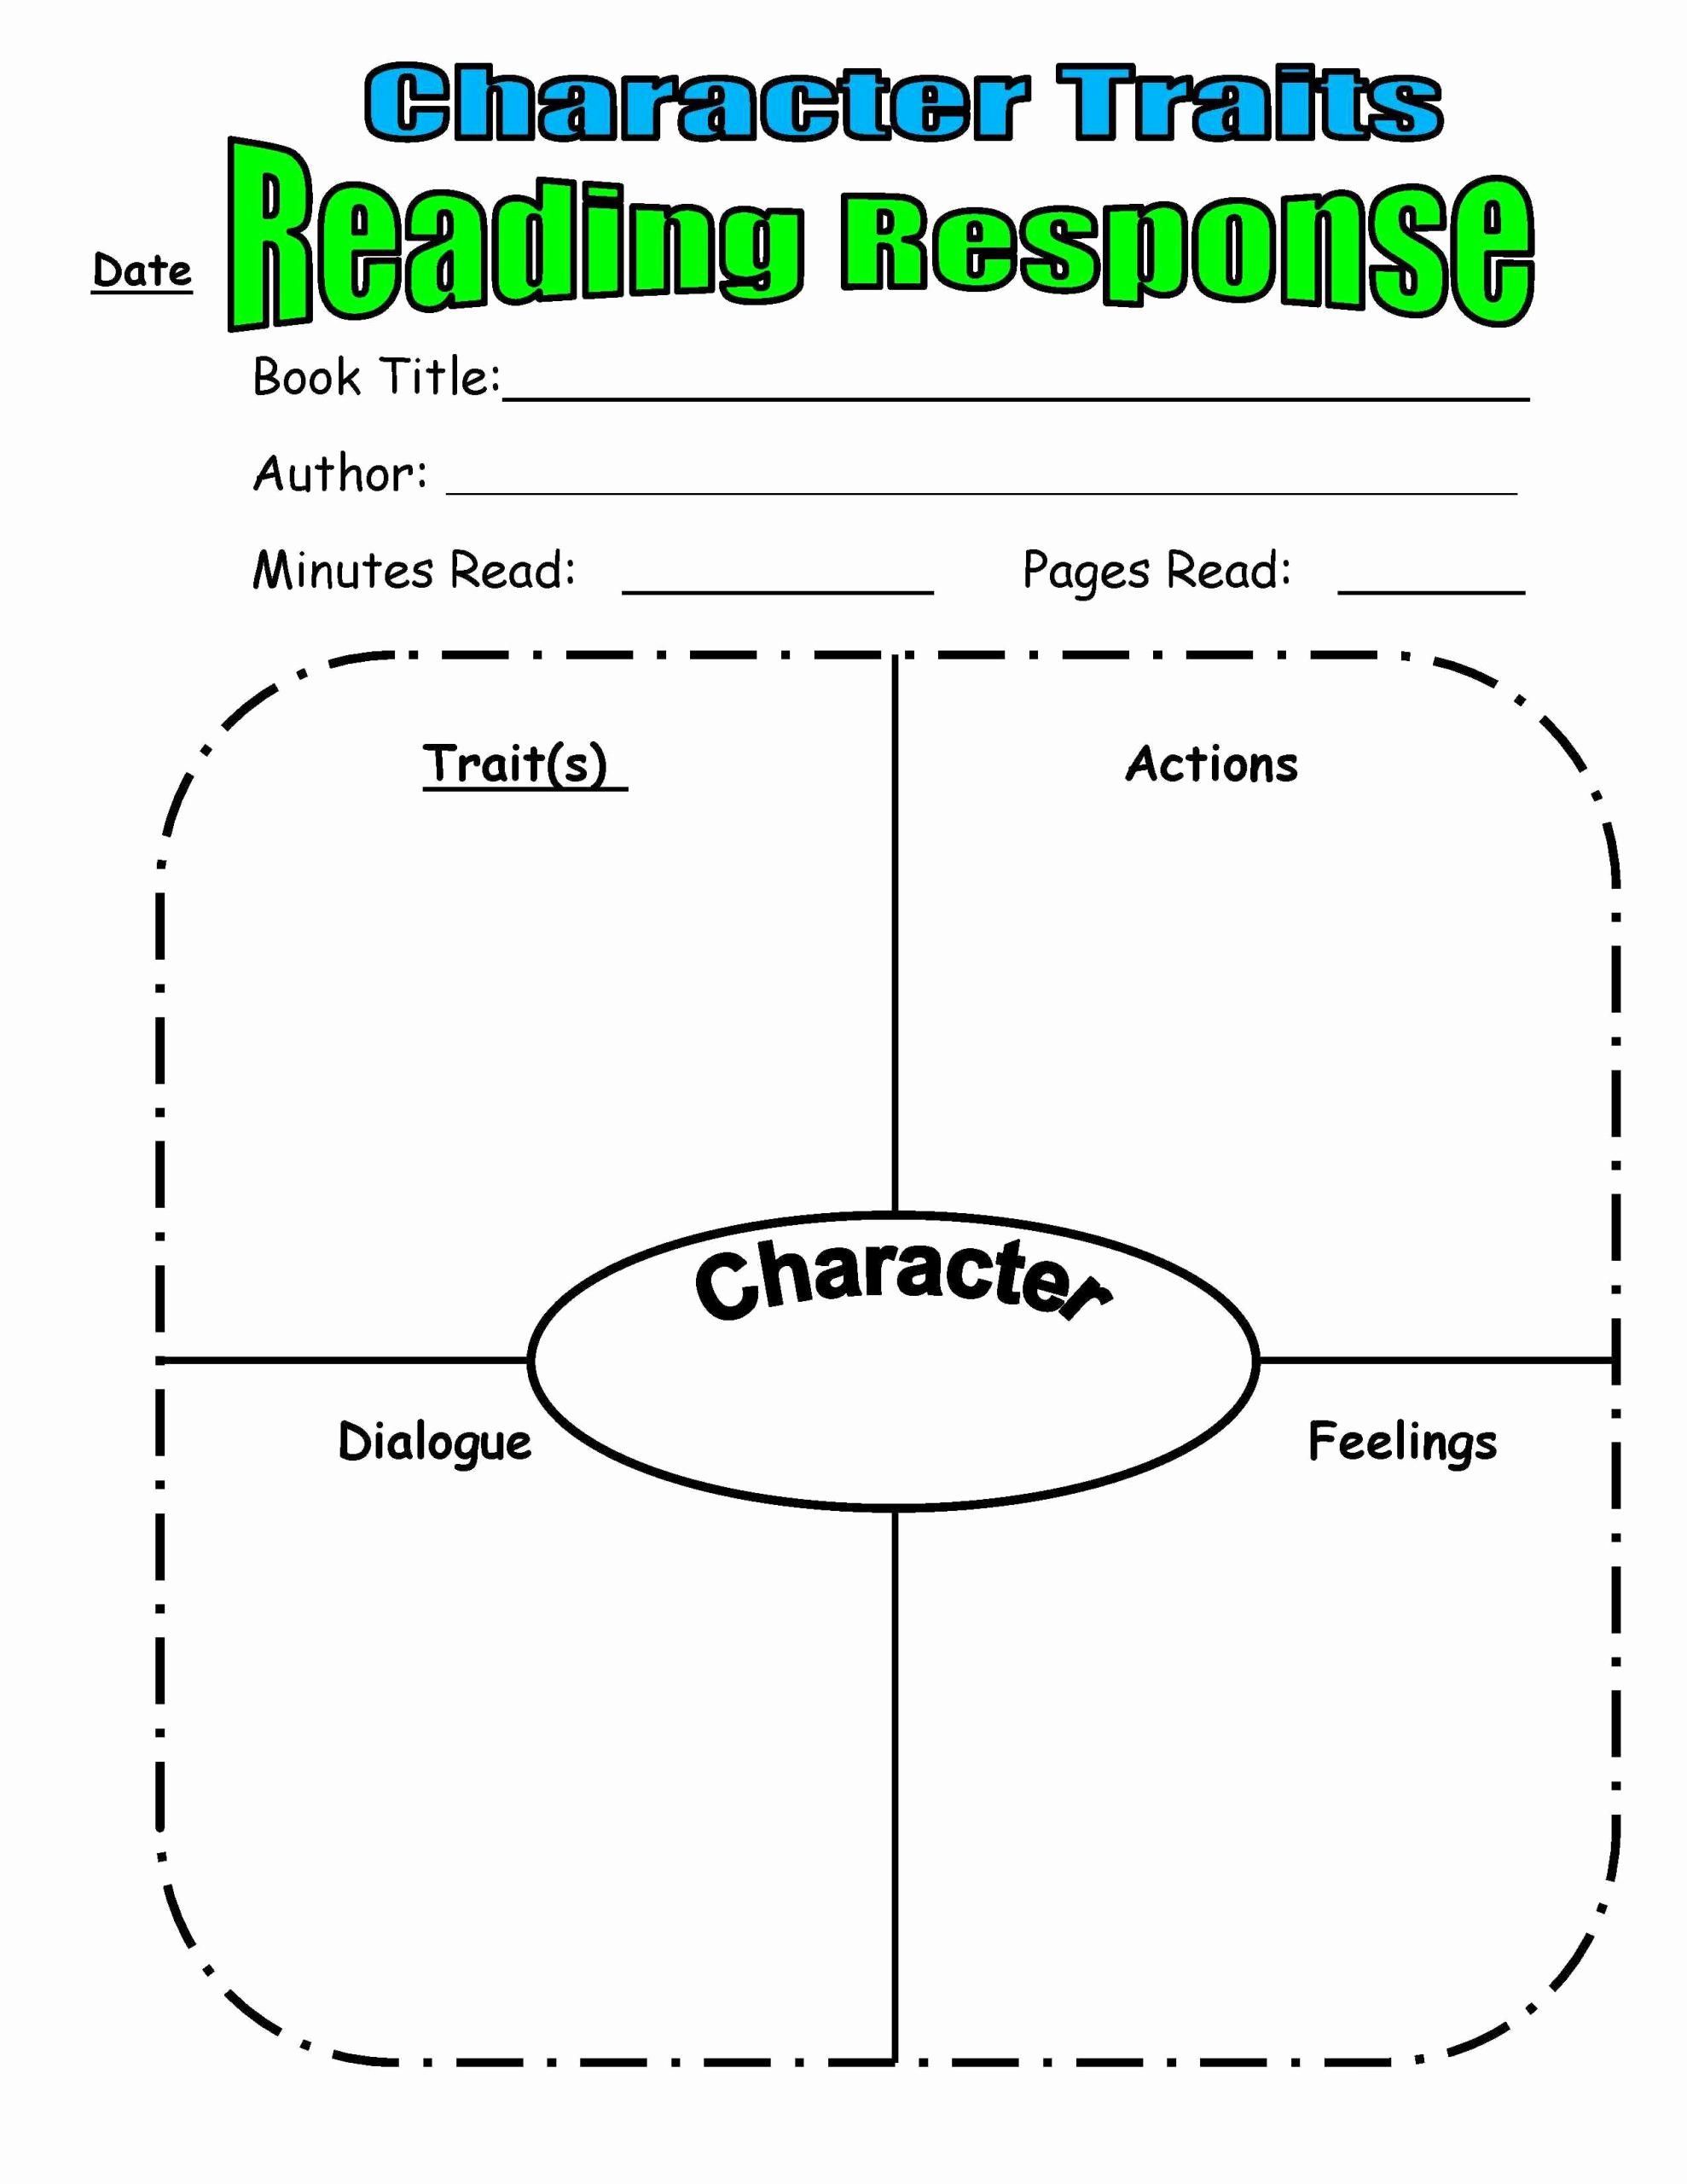 Character Traits Worksheet 2nd Grade Beautiful 20 Character Traits Worksheet 2nd Grade